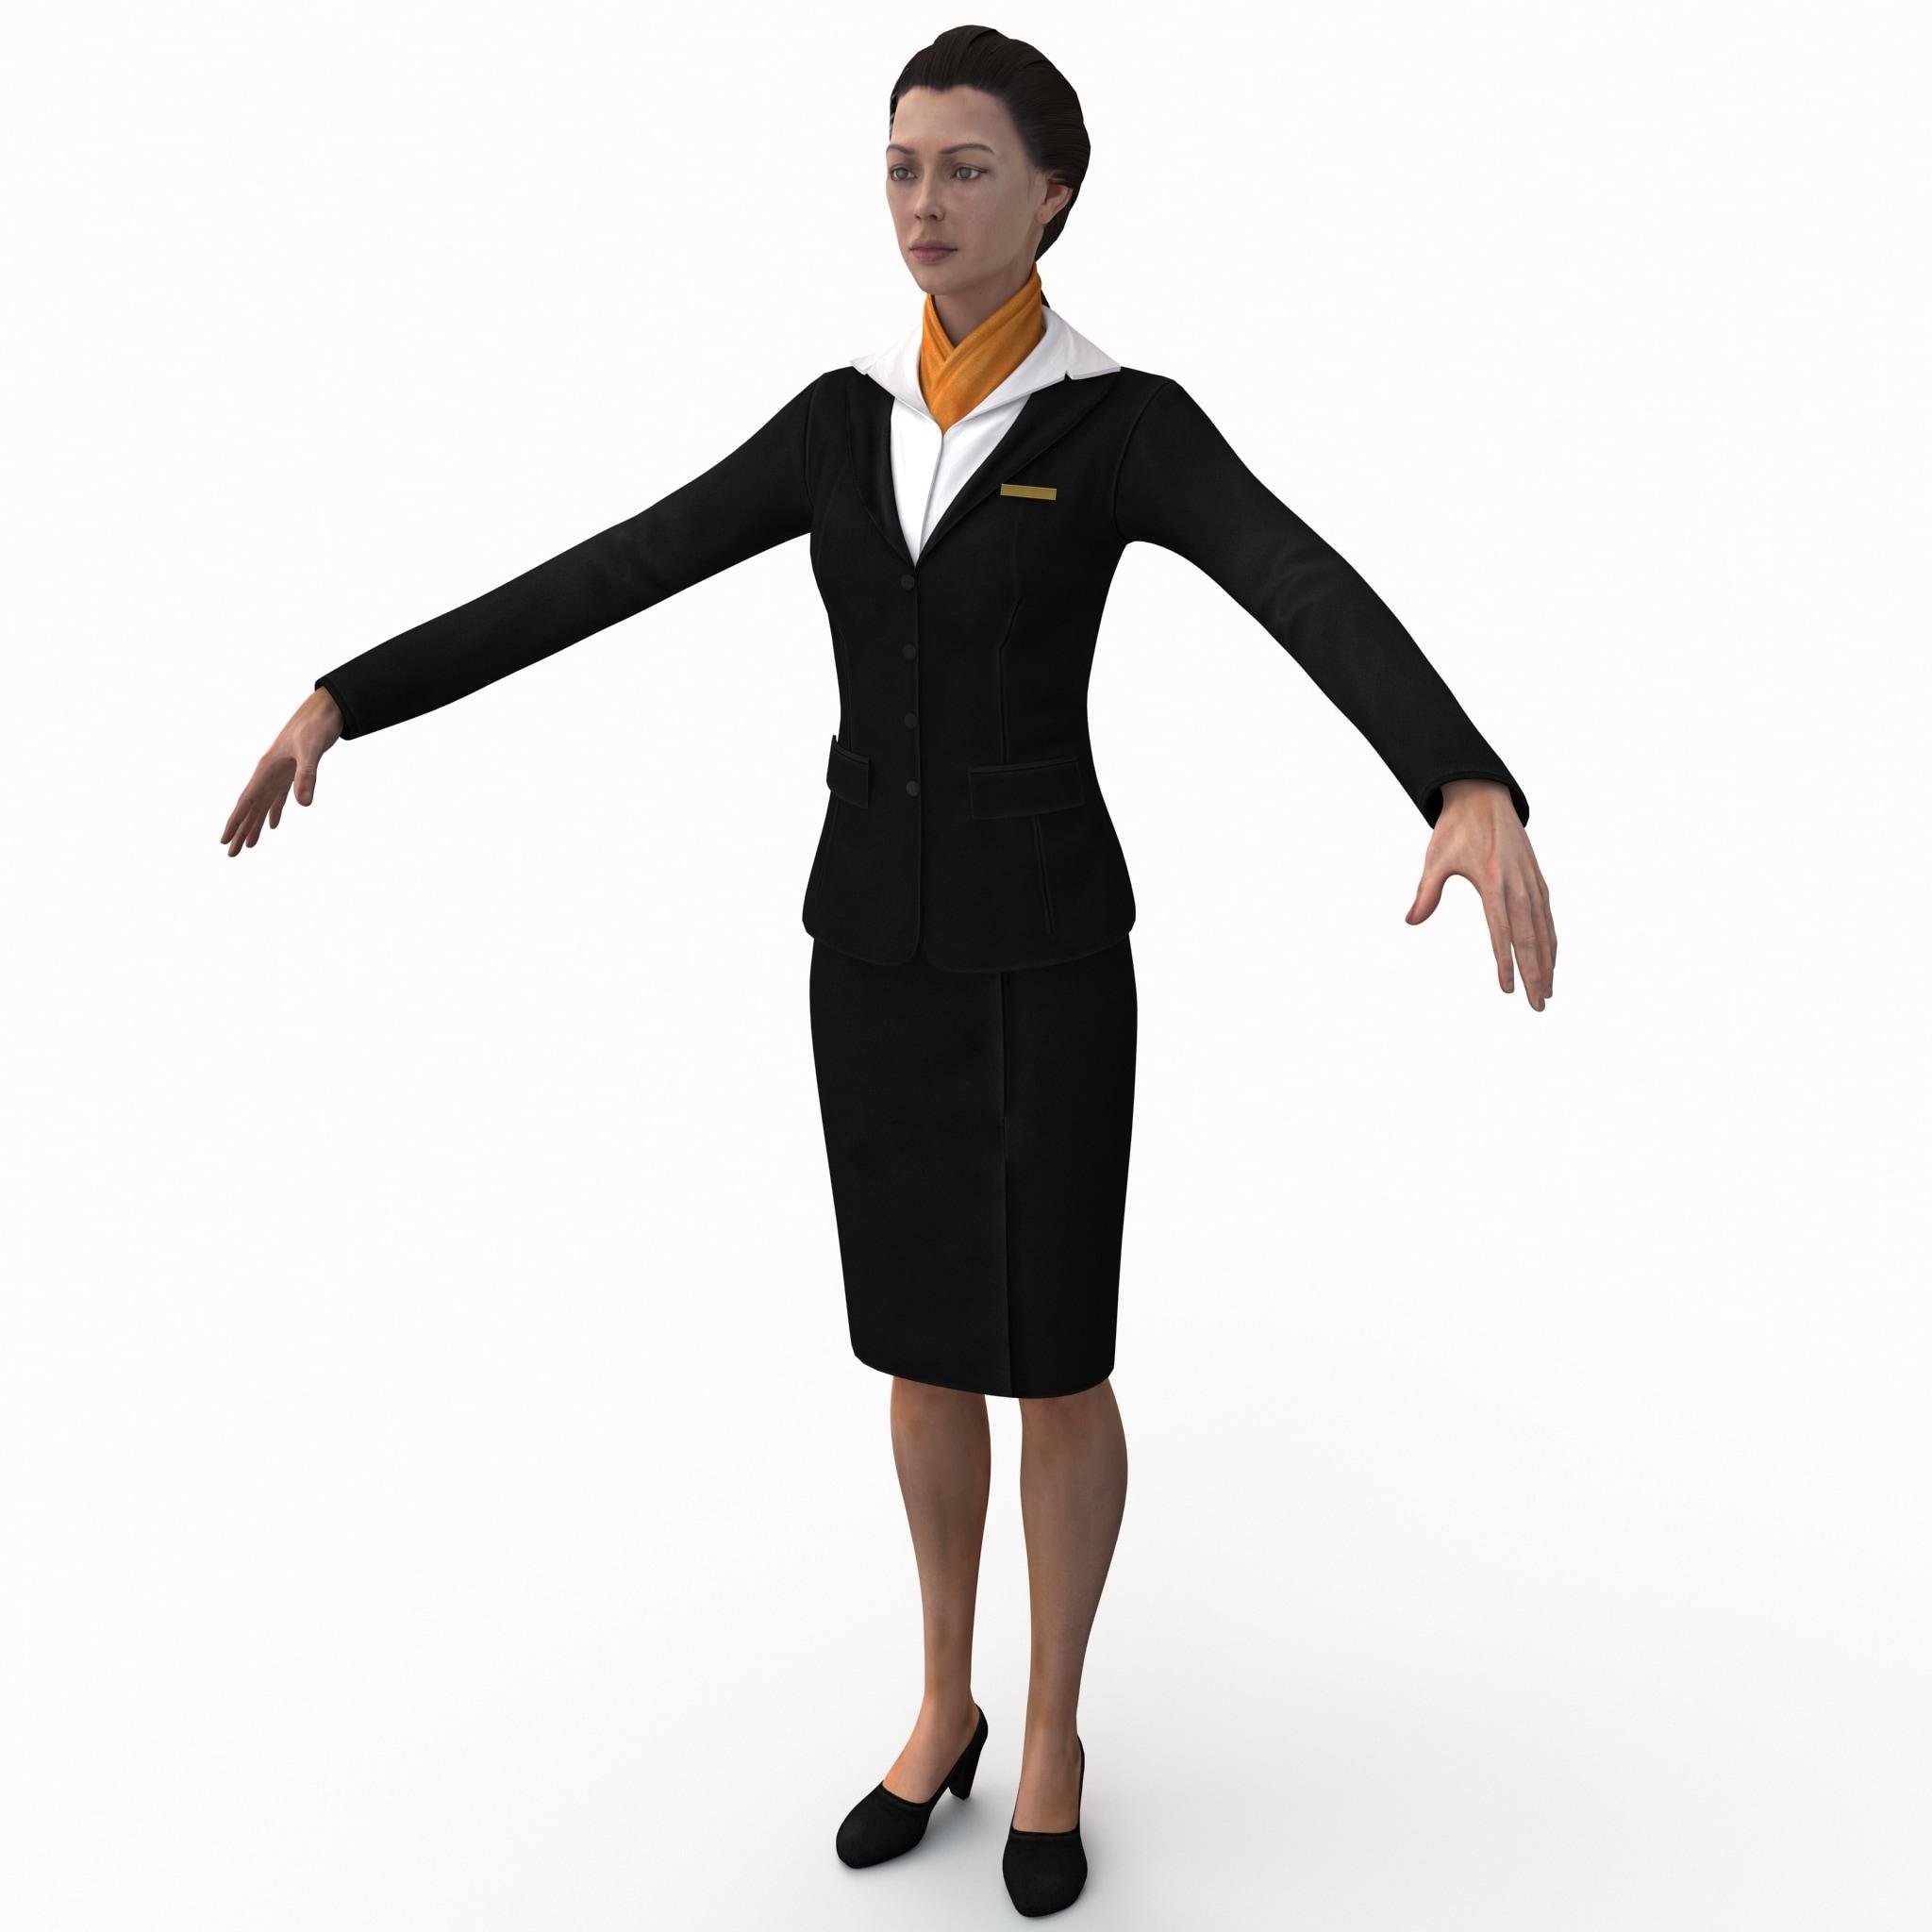 female flight attendant rigged 3d model